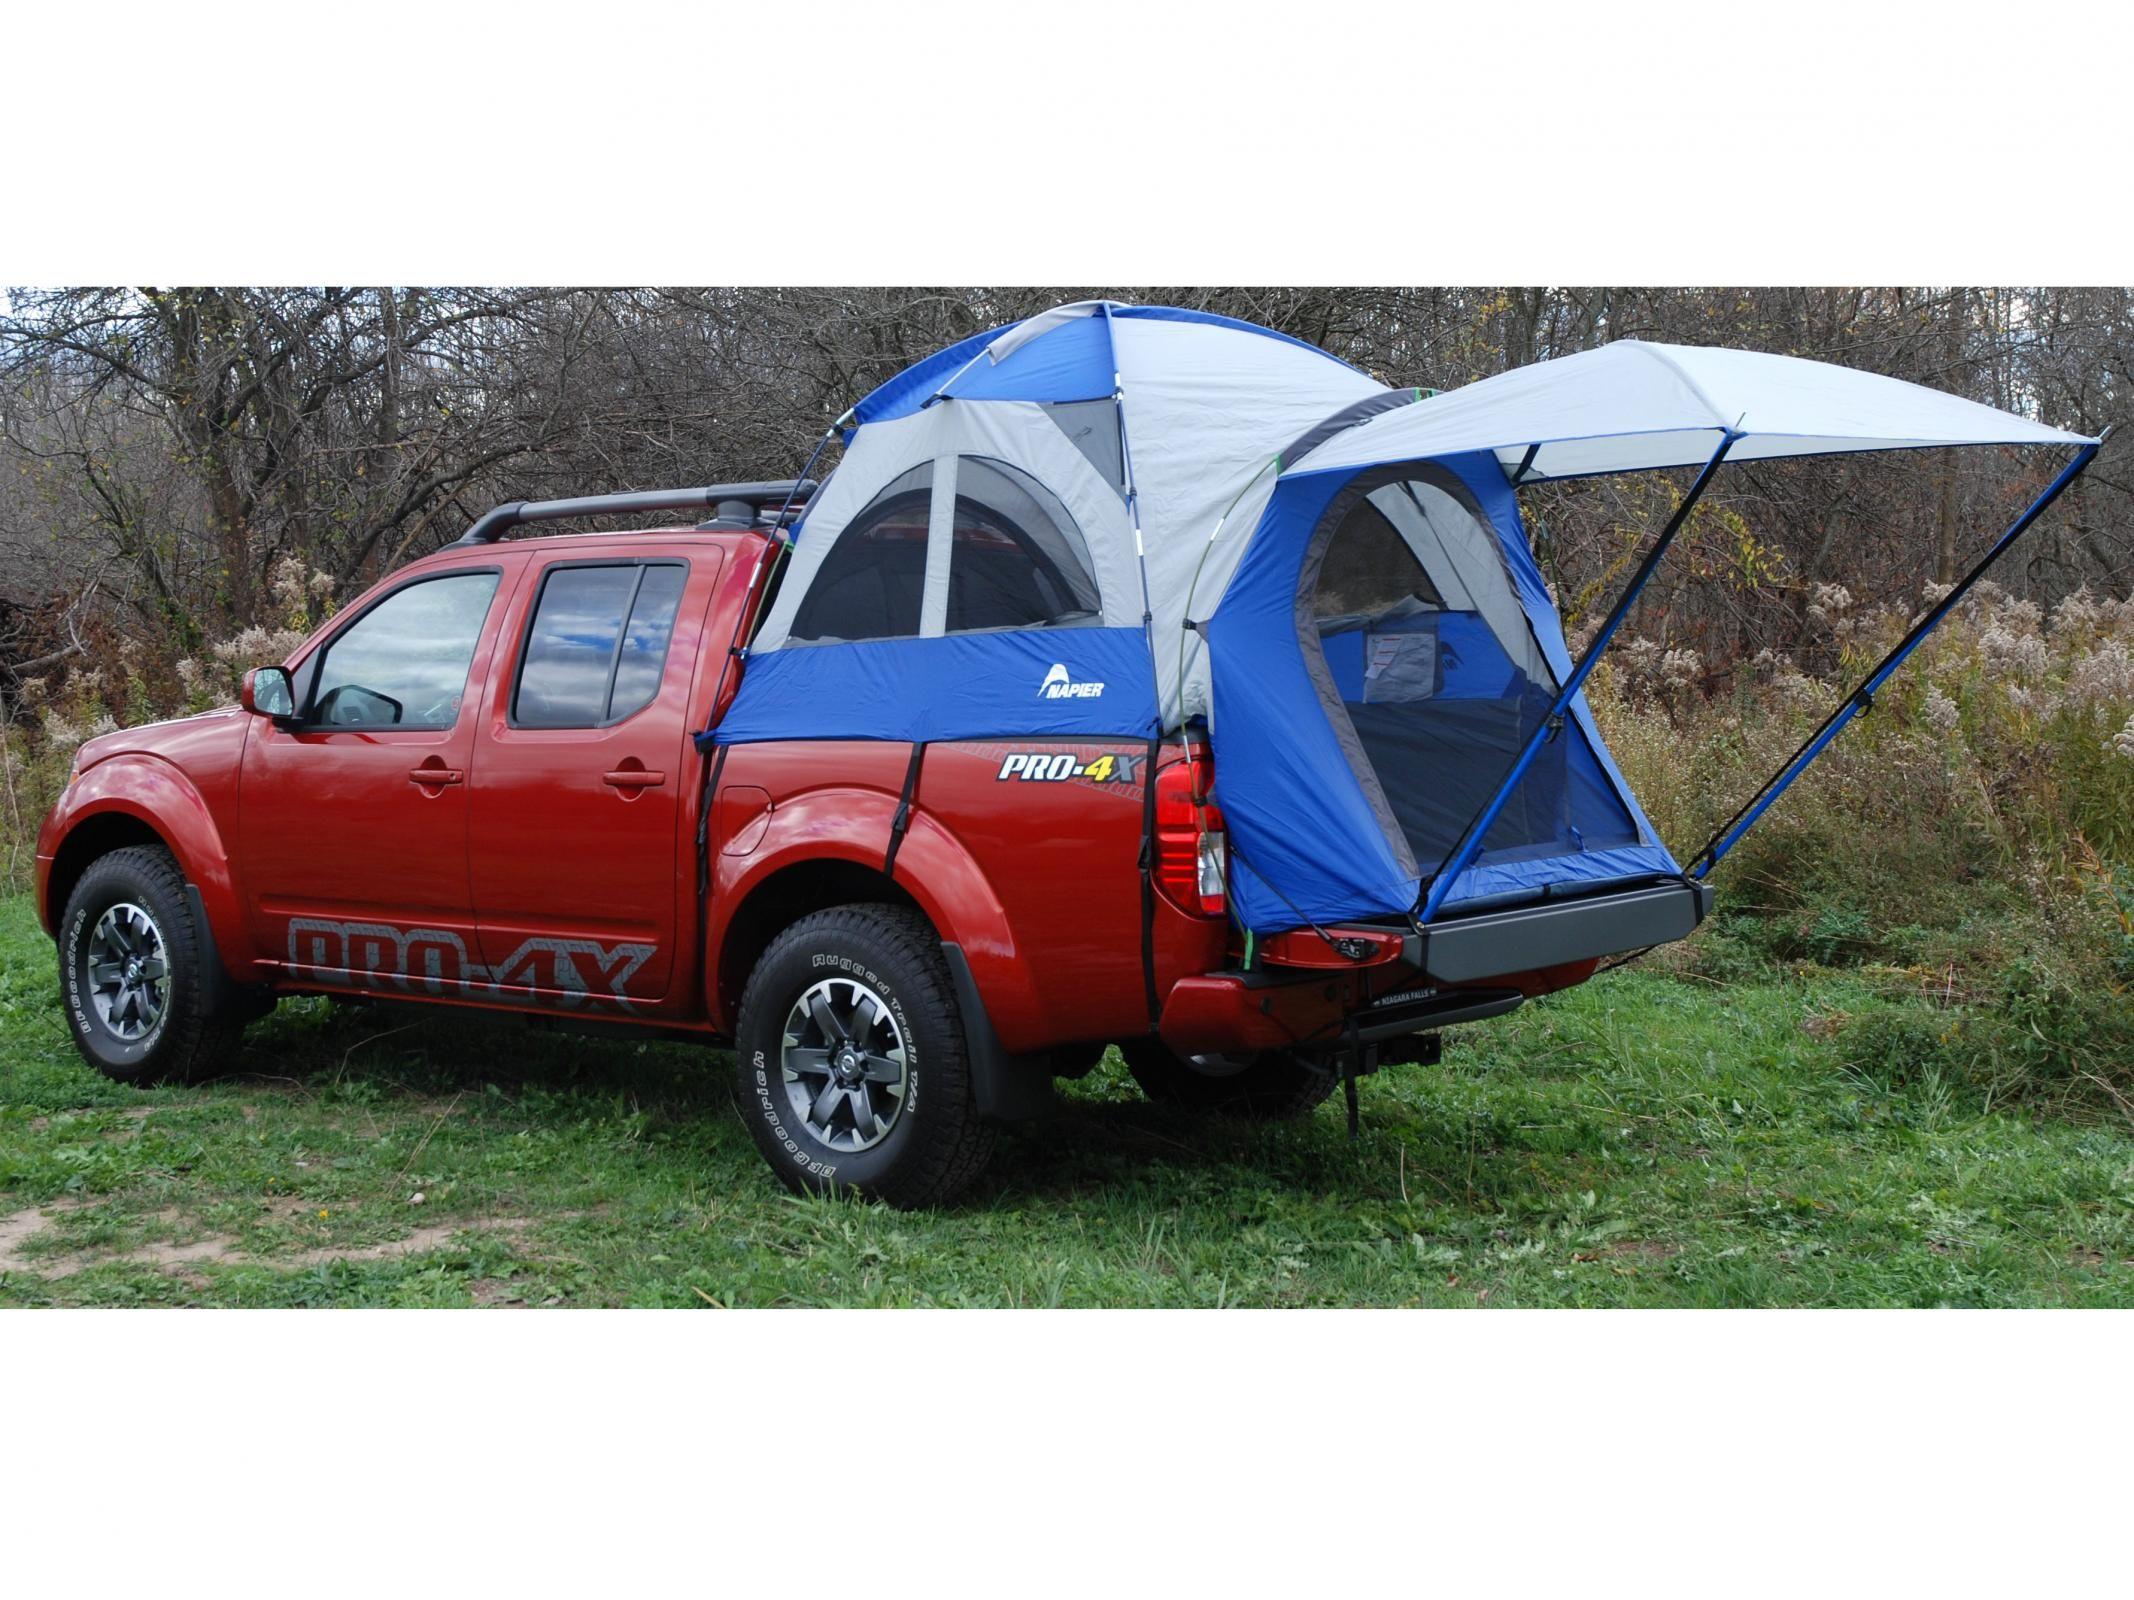 Niagara Falls, NY (2015) The Sportz 57 Series Truck Tent